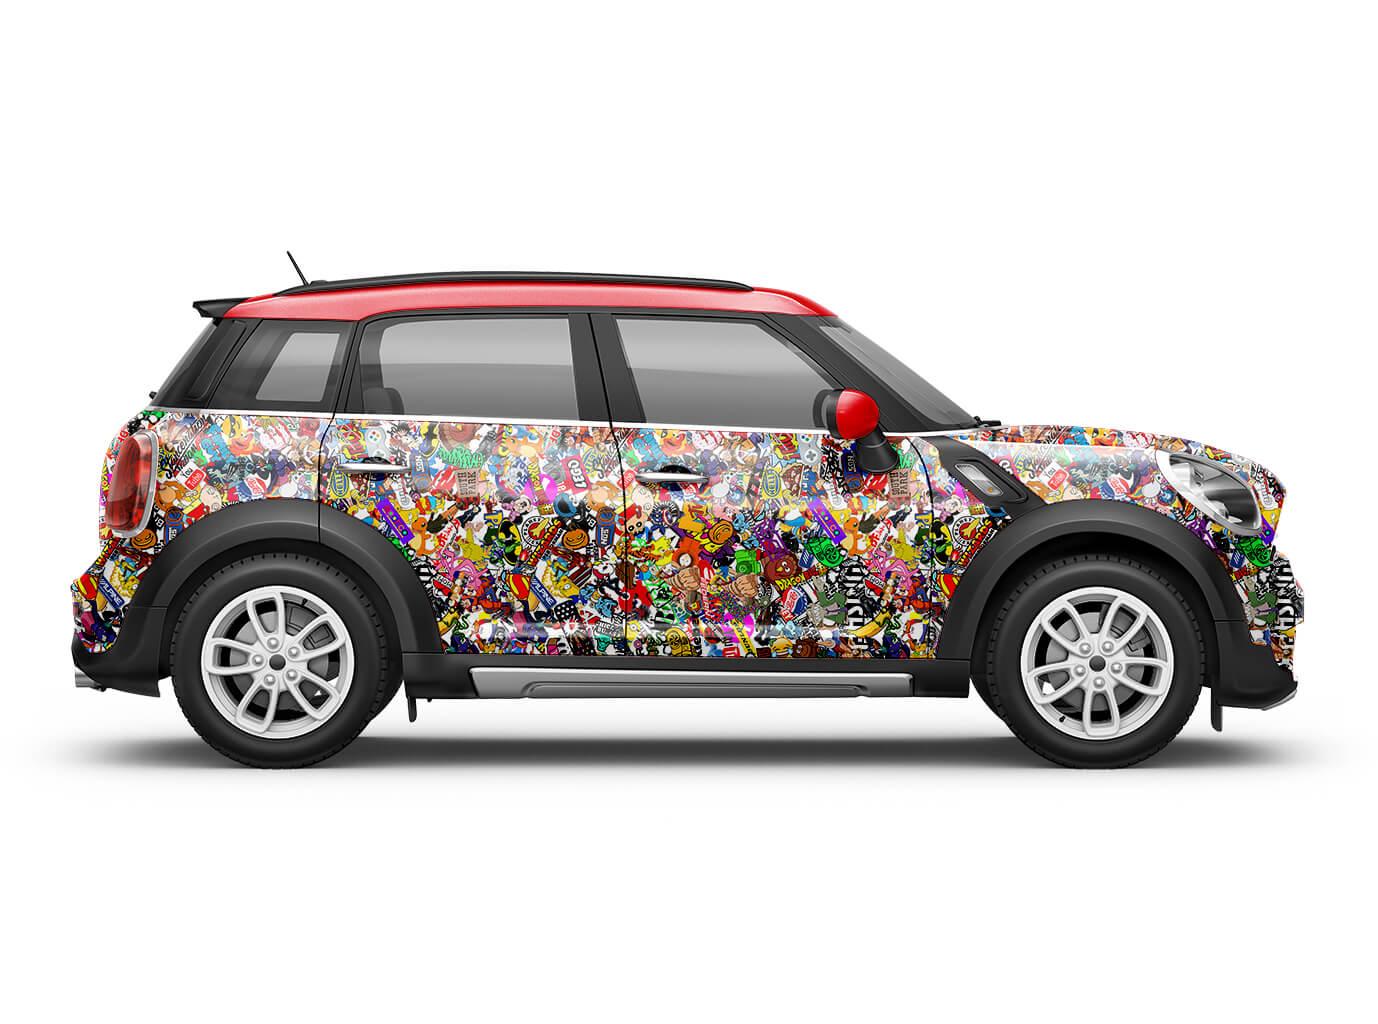 Sticker Bomb Cartoon Auto Folie Fürs Car Wrapping Mit Luftkanälen